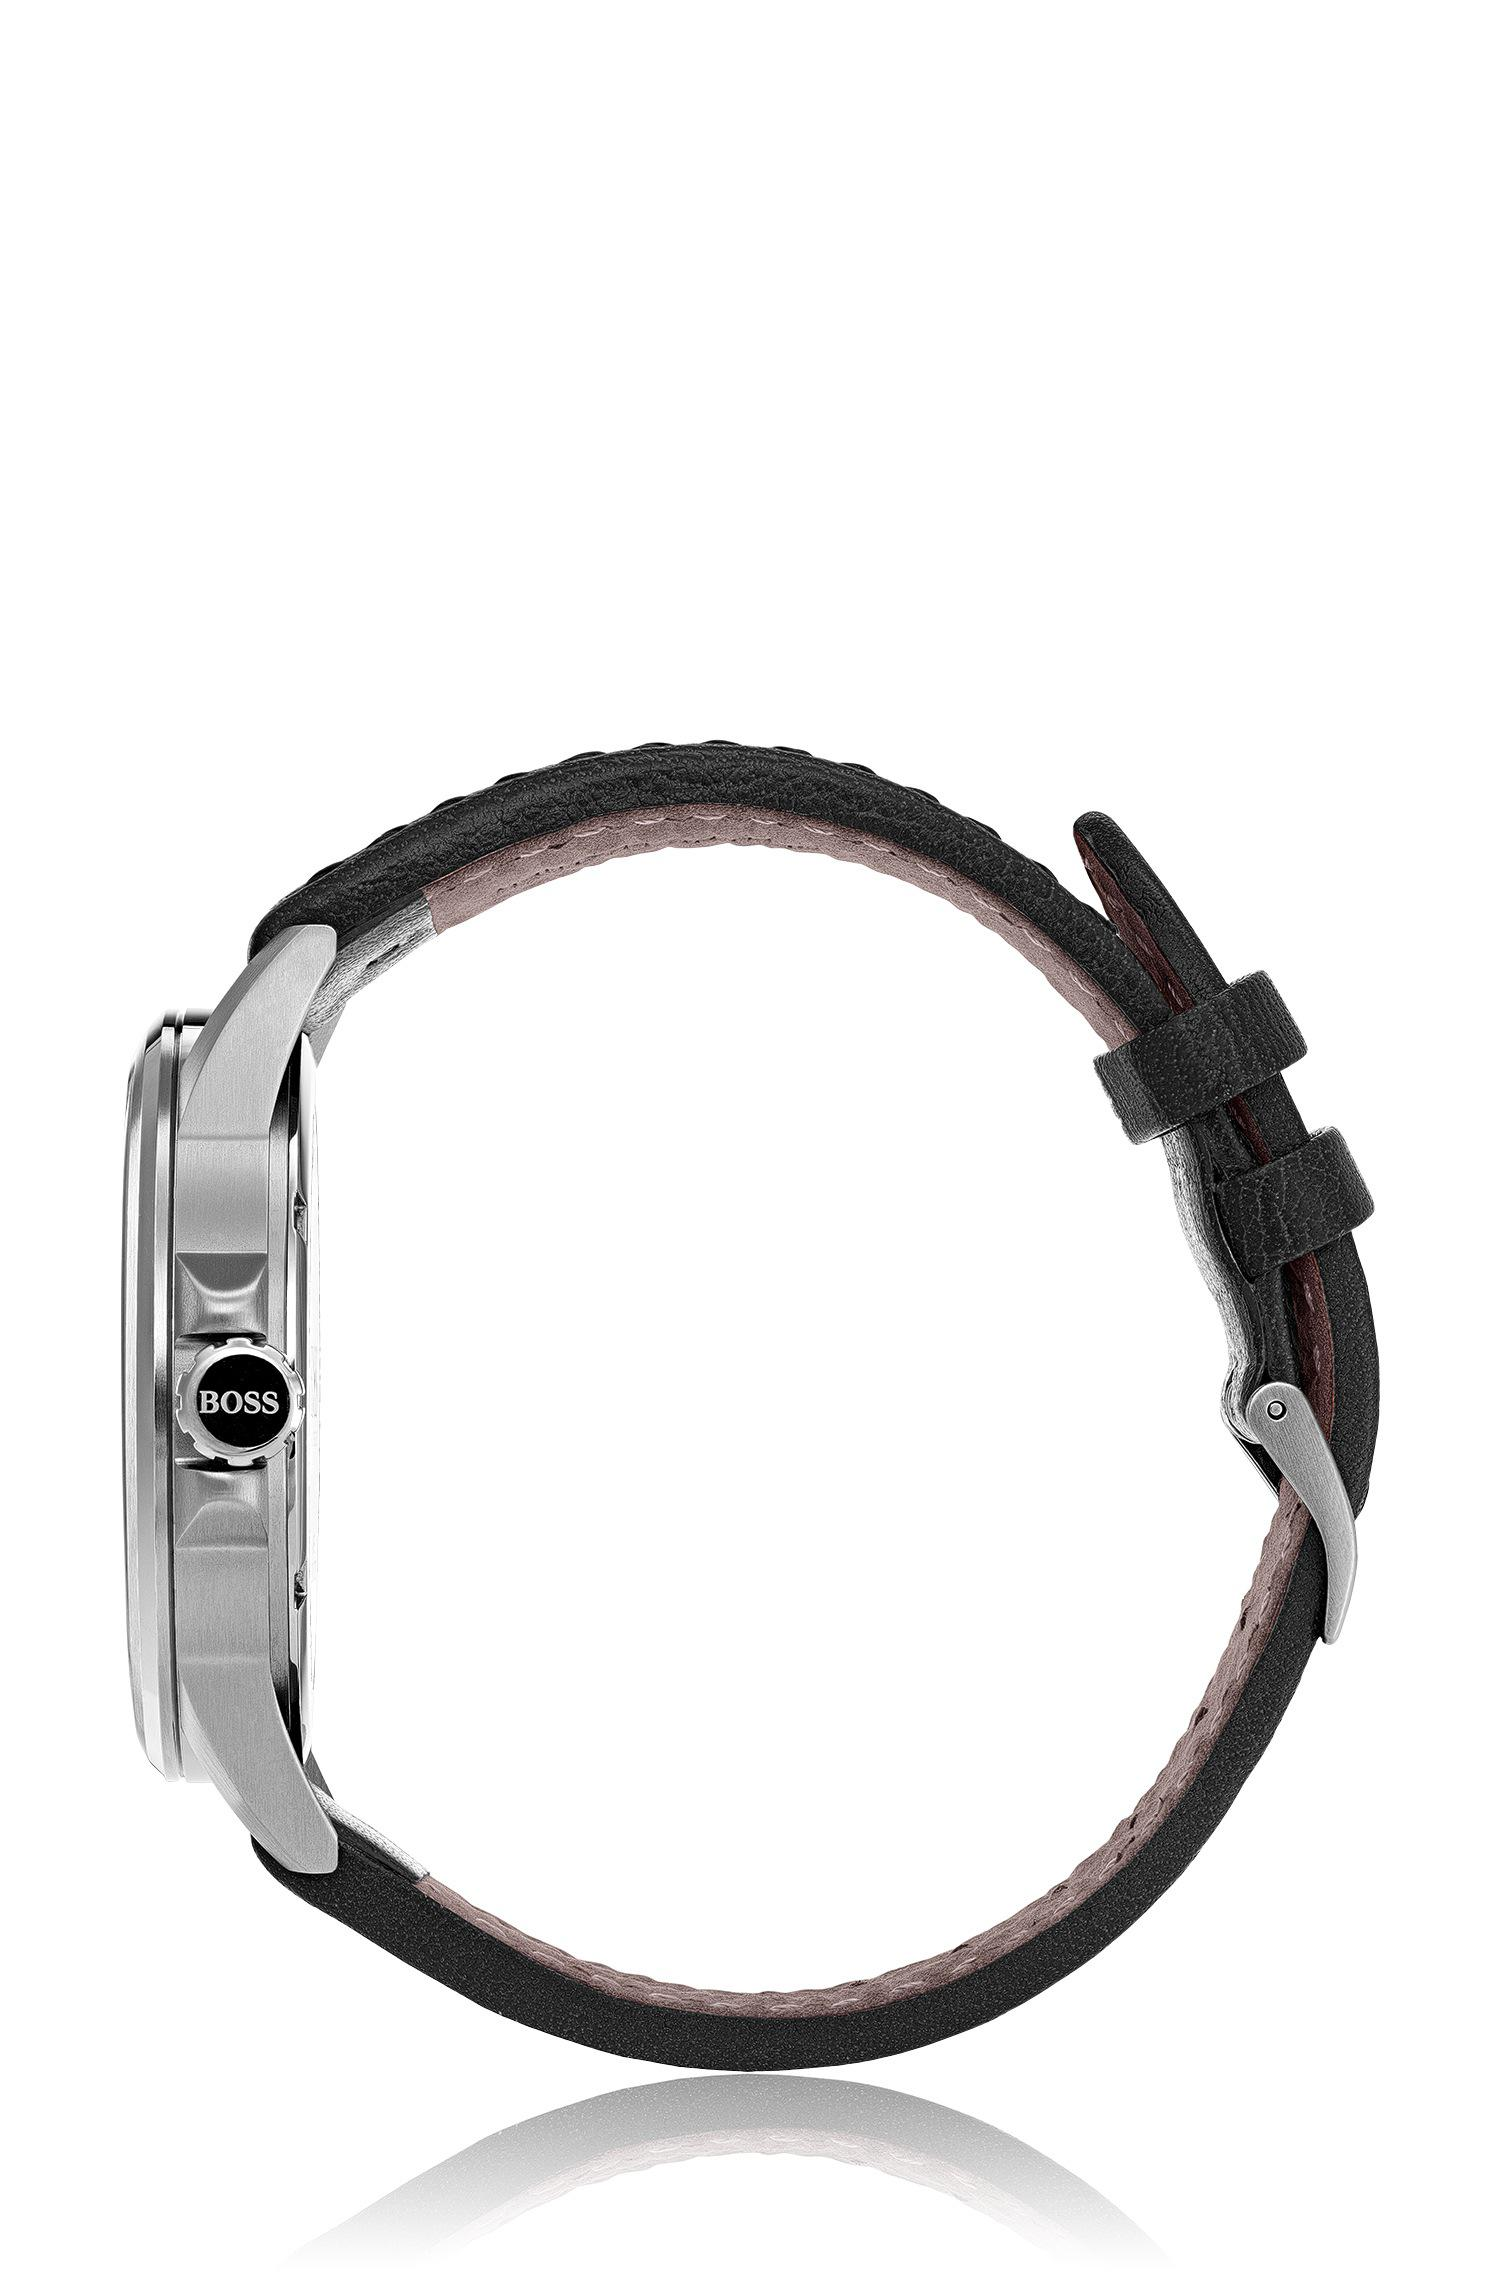 69d0d942e BOSS Aviator Casual Sport, Leather Strap Watch | 1513515 for Men - Lyst